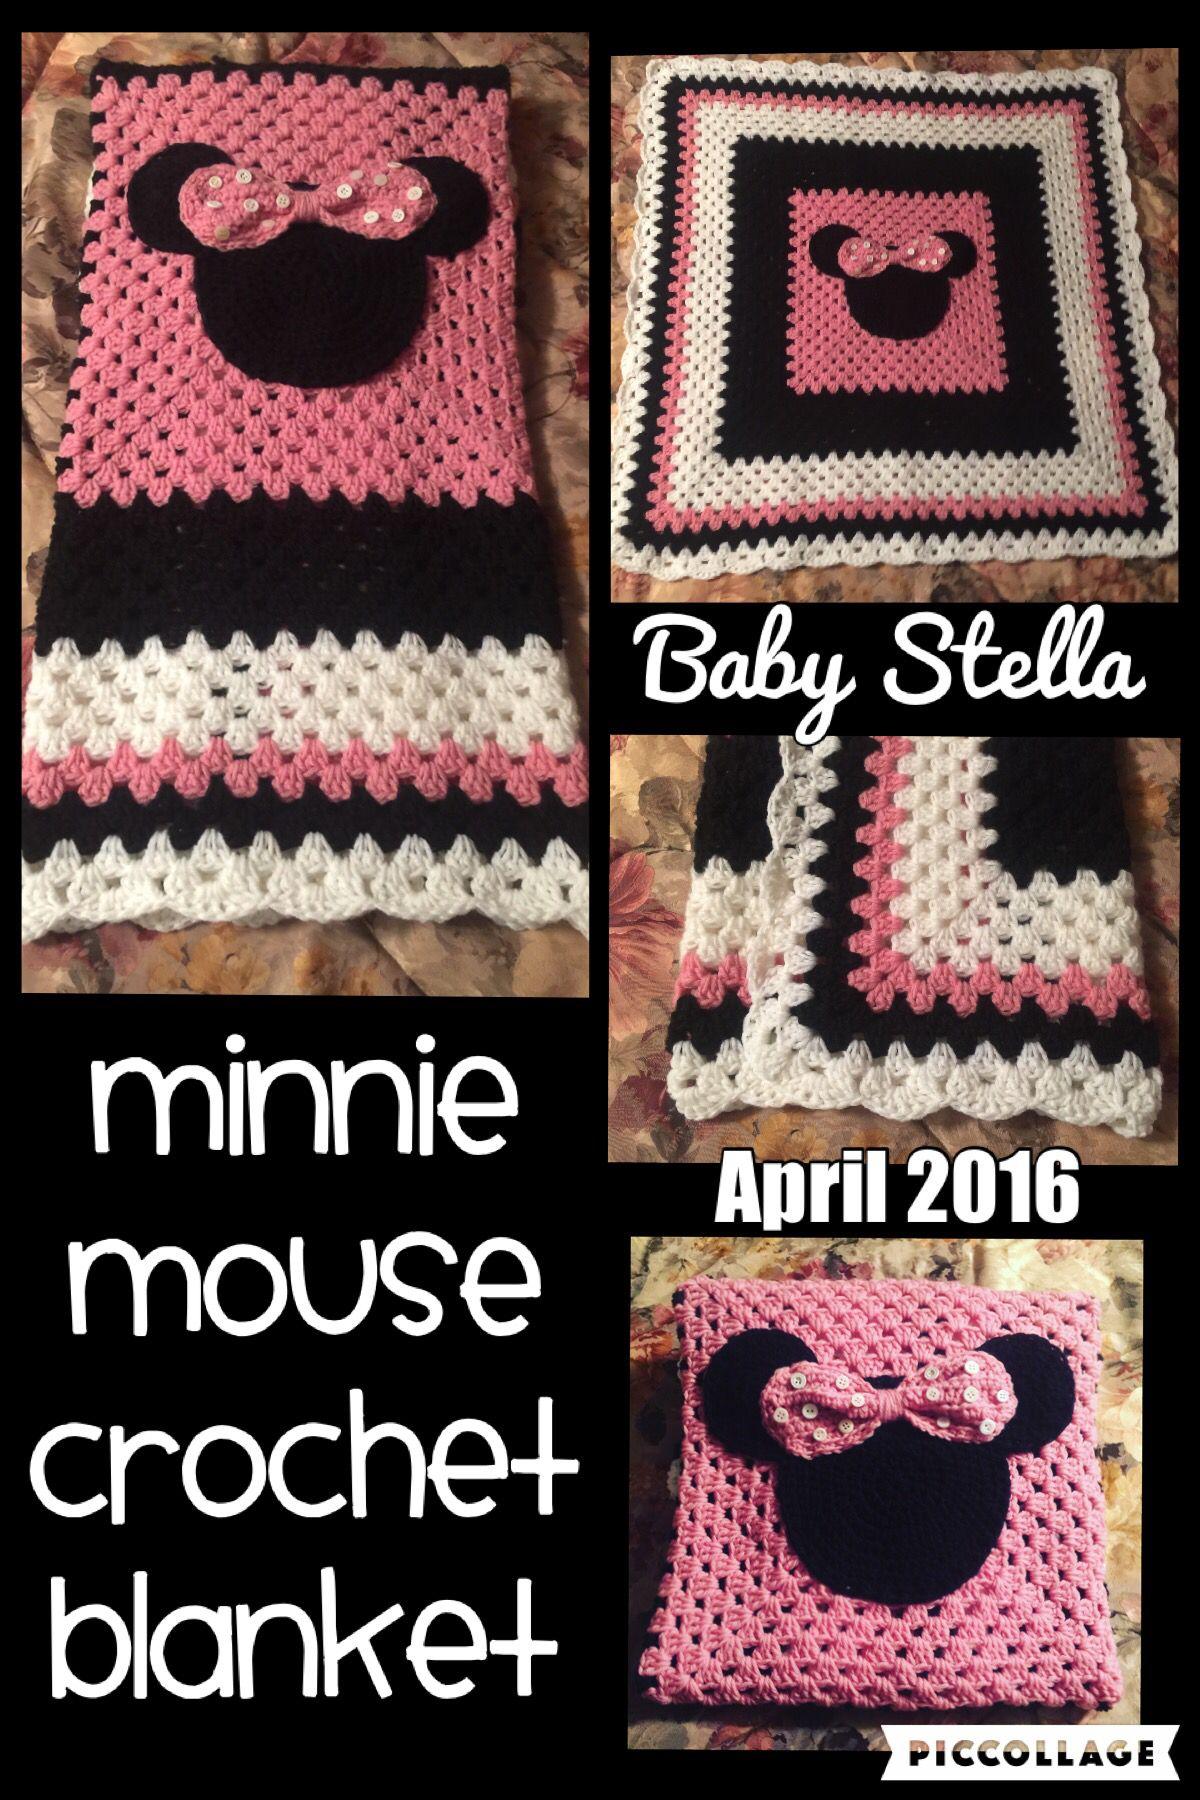 Minnie Mouse Crochet Blanket Im Hooked Crochet Crochet Disney